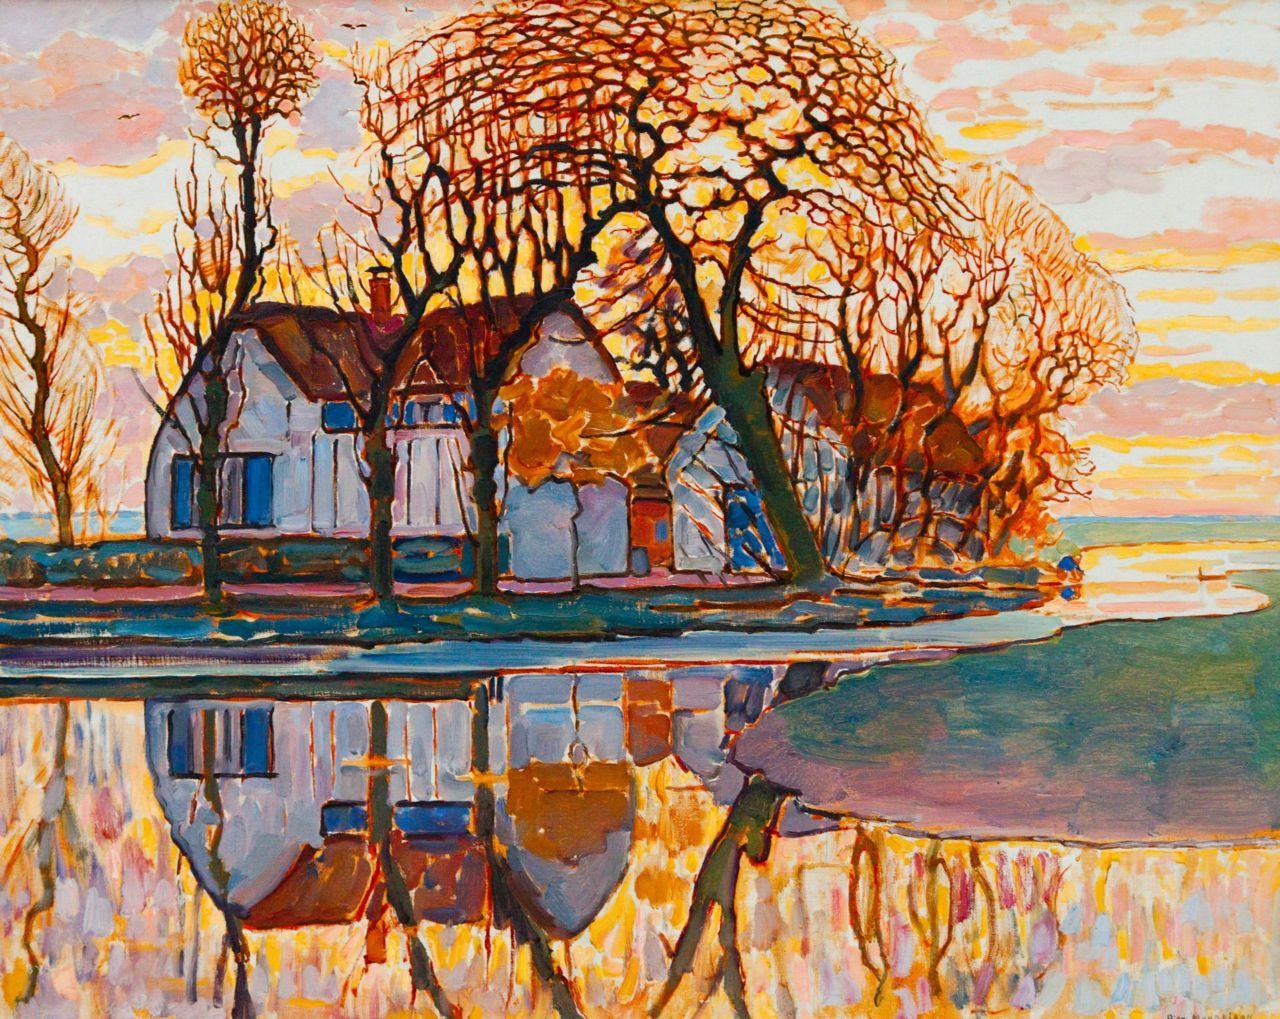 Farm near Duivendrecht by Piet Mondrian, 1916 I love